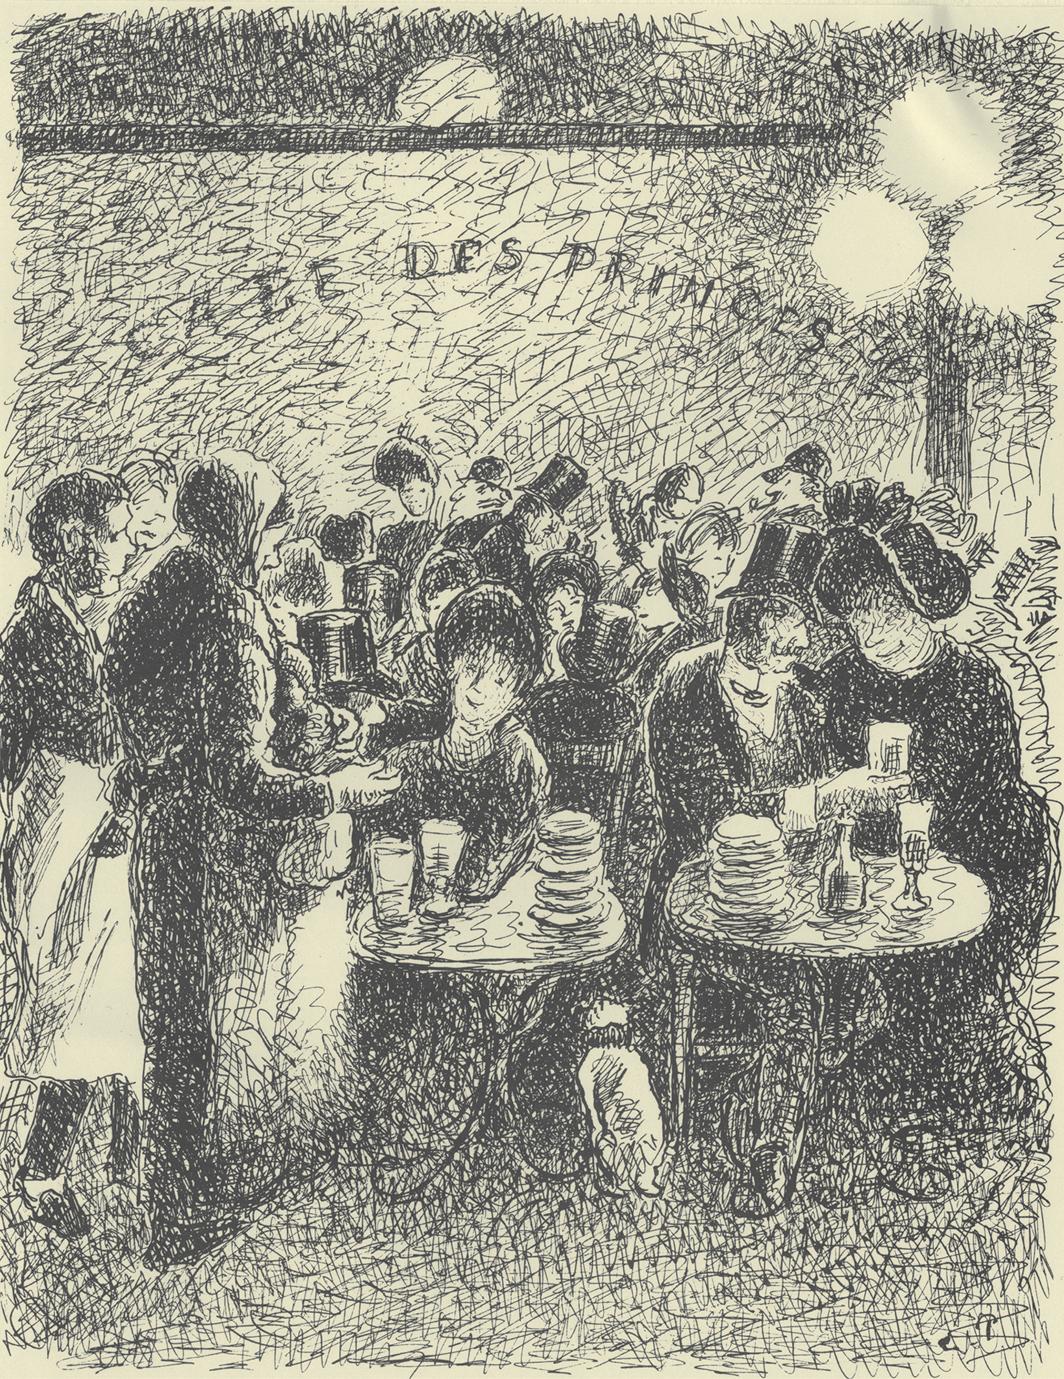 "Camille Pissarro, La vertu récompensée (Virtue Rewarded), 1889–90, ink and pencil on paper, 12 1⁄4 × 9 1⁄2"". From Turpitudes sociales (Social Disgraces), 1889–90."